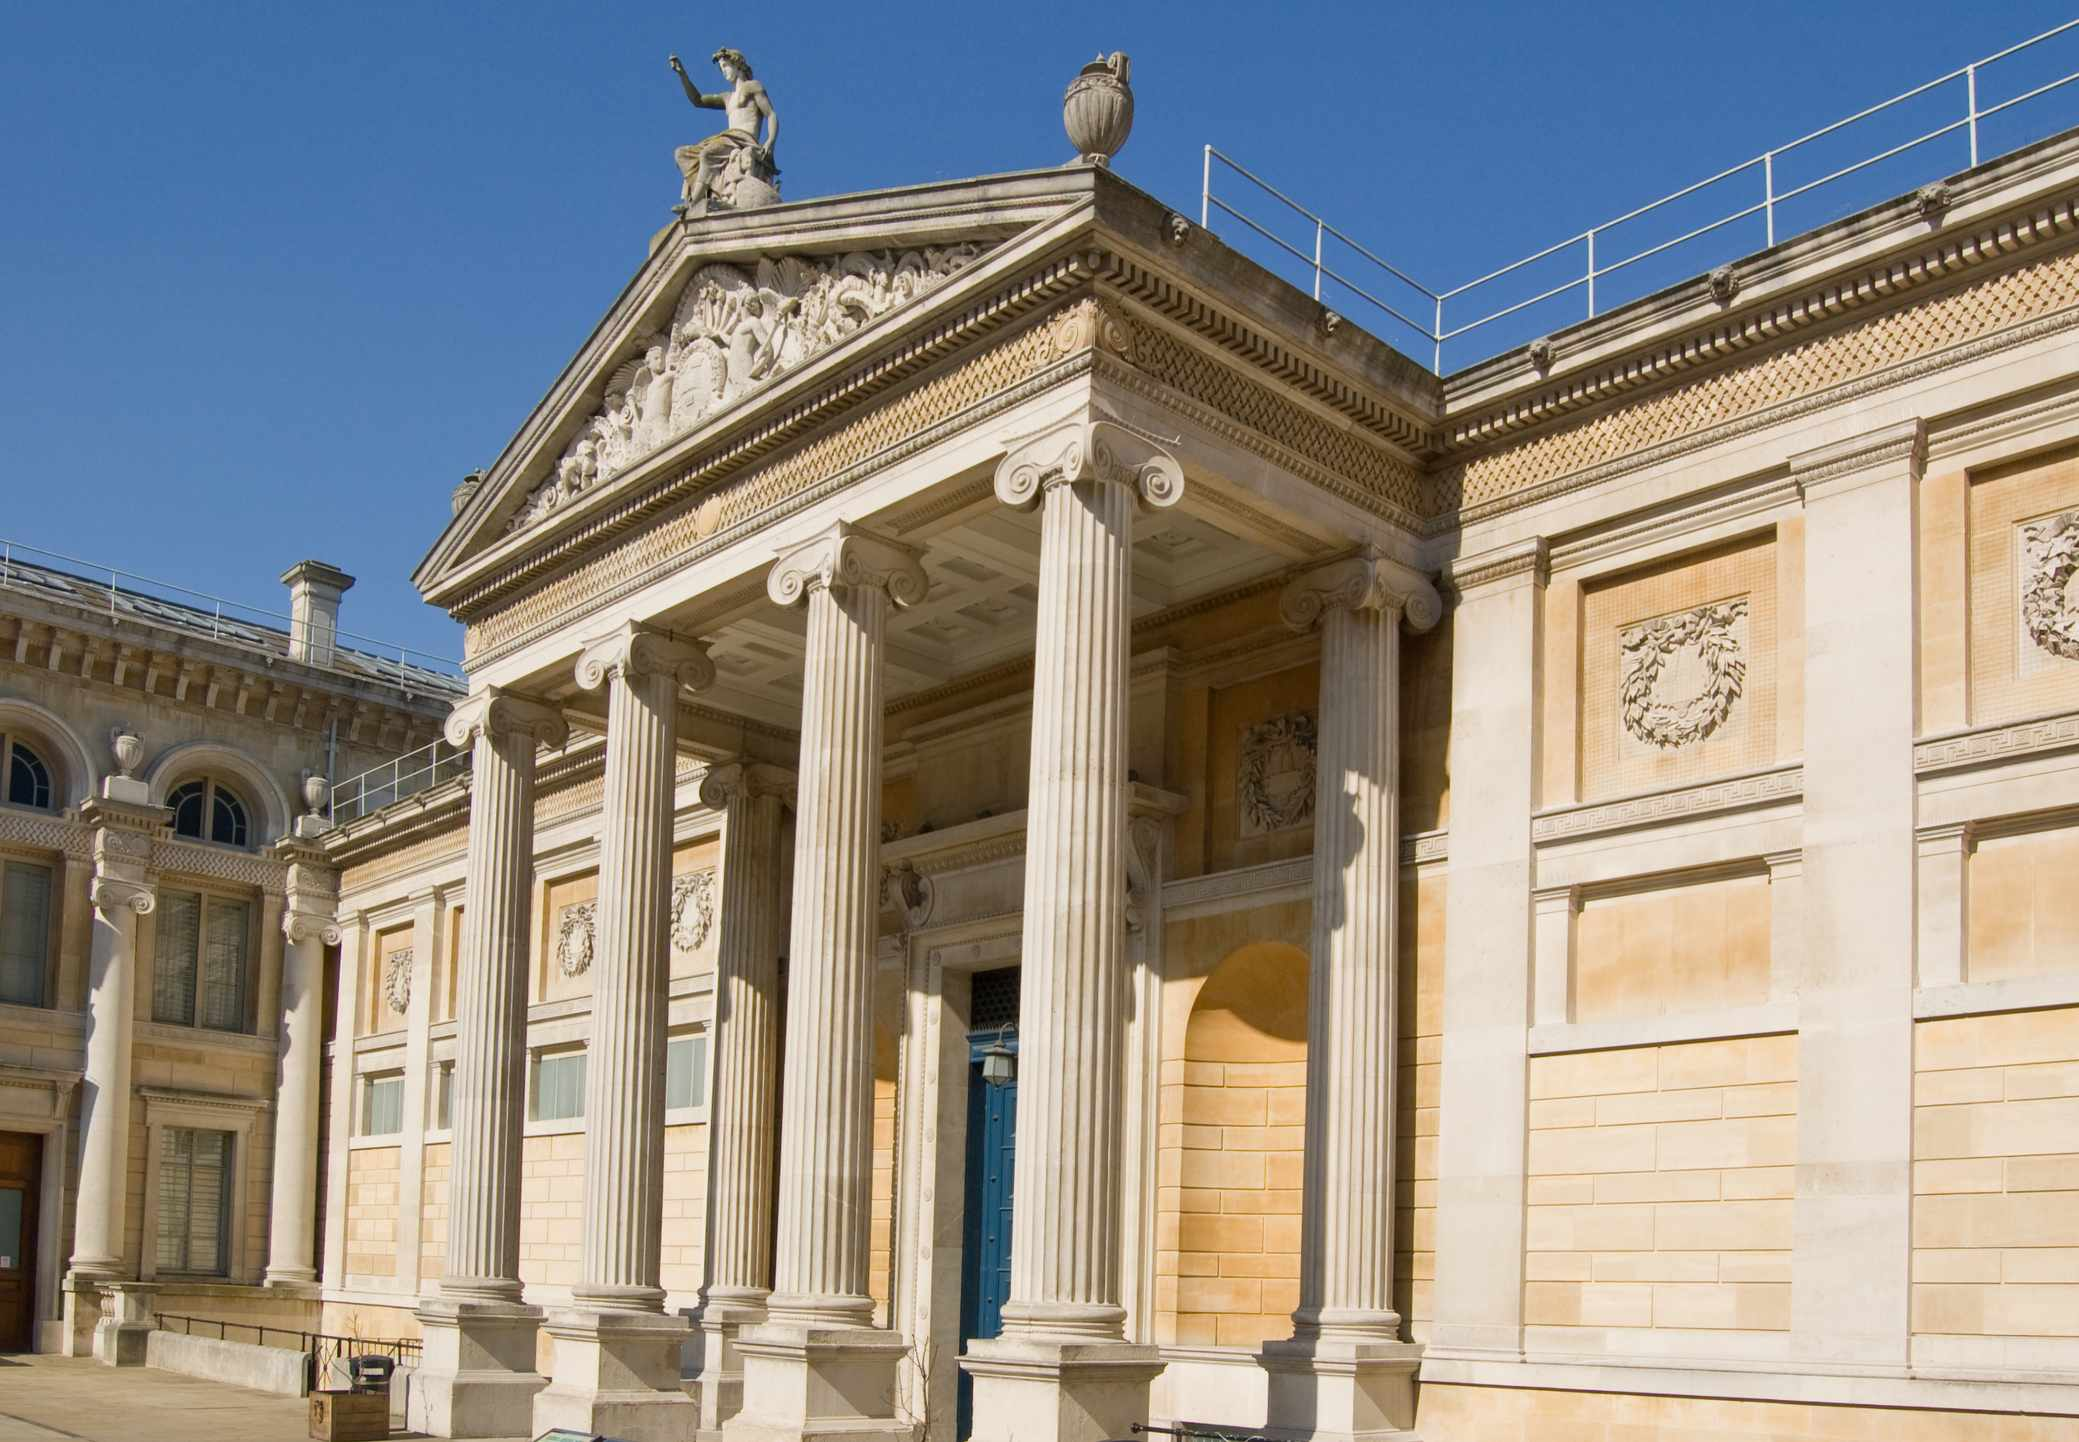 Portico entrance of Oxford's famous Ashmolean Museum. (Dreamstime)